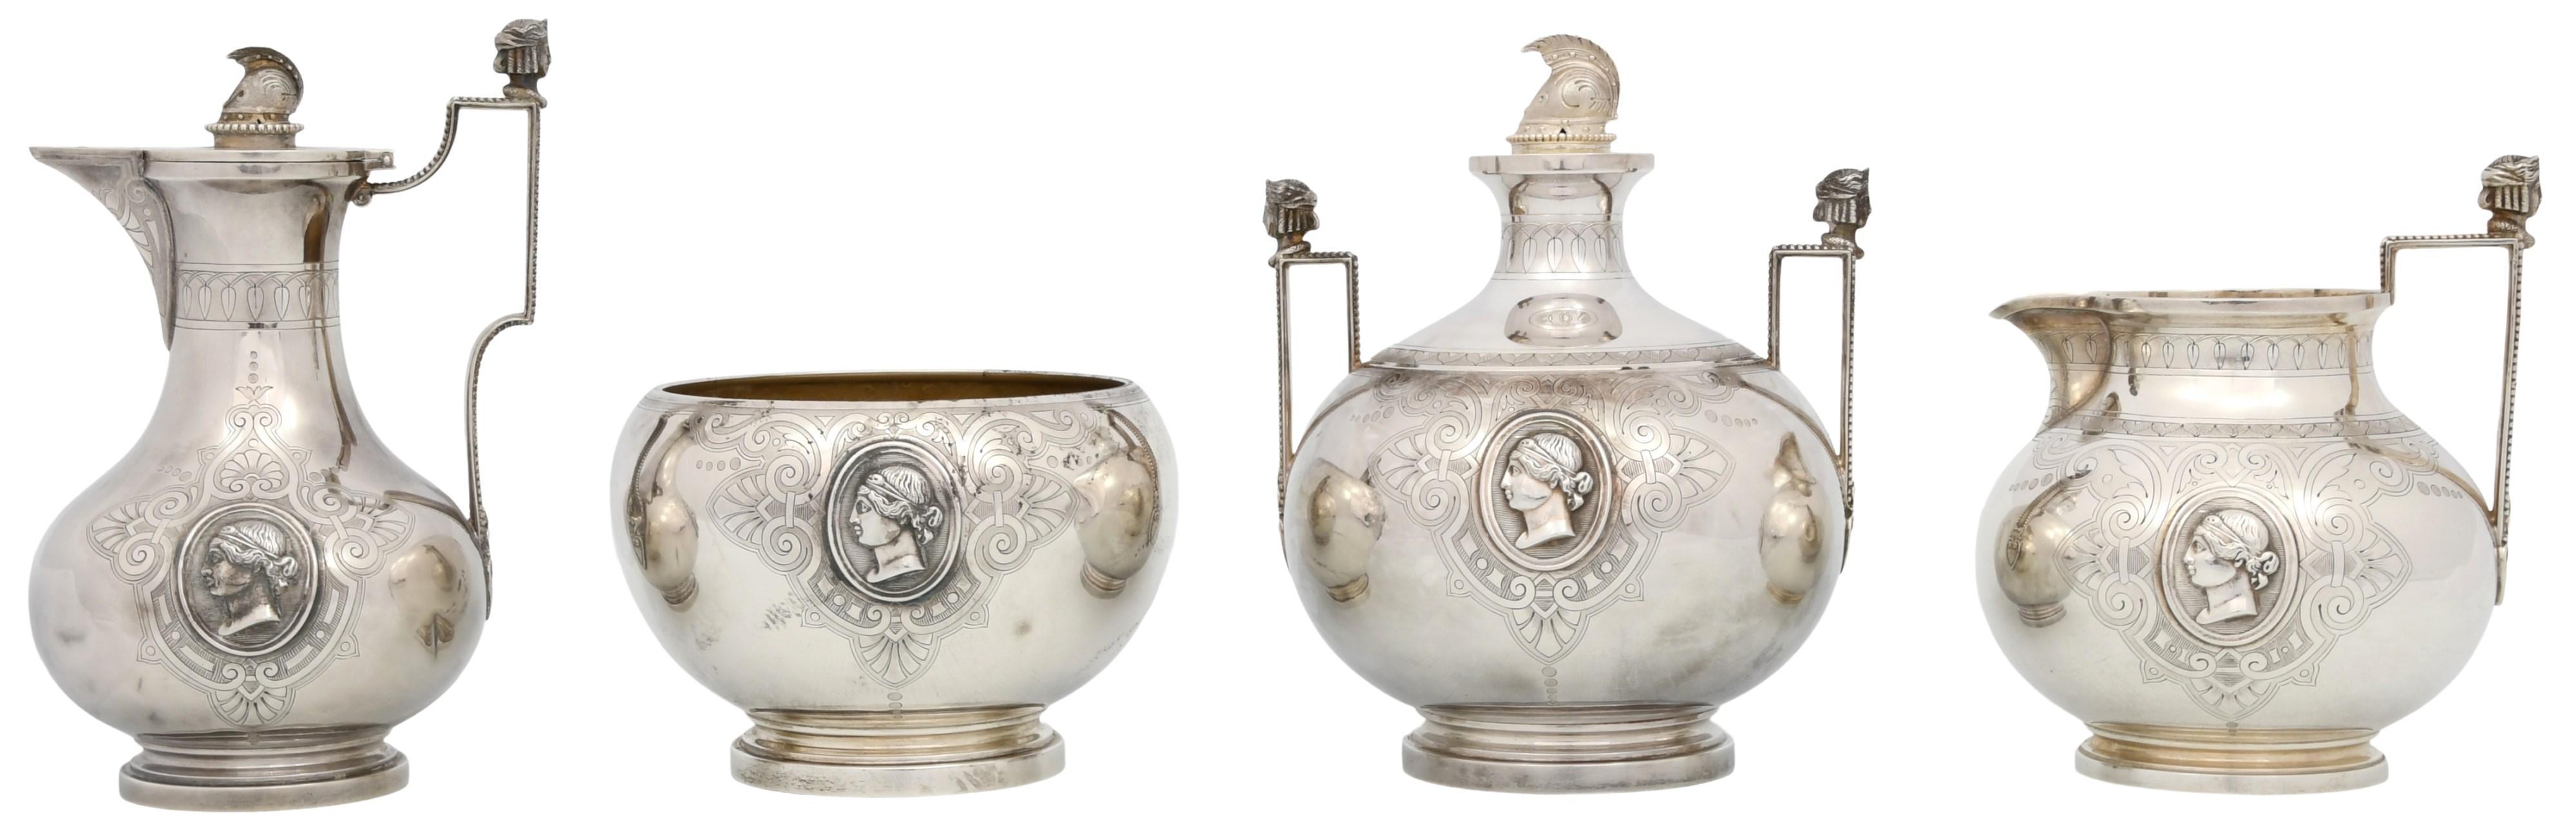 Four Tiffany & Co./Ball, Black & Co. Silver Pieces